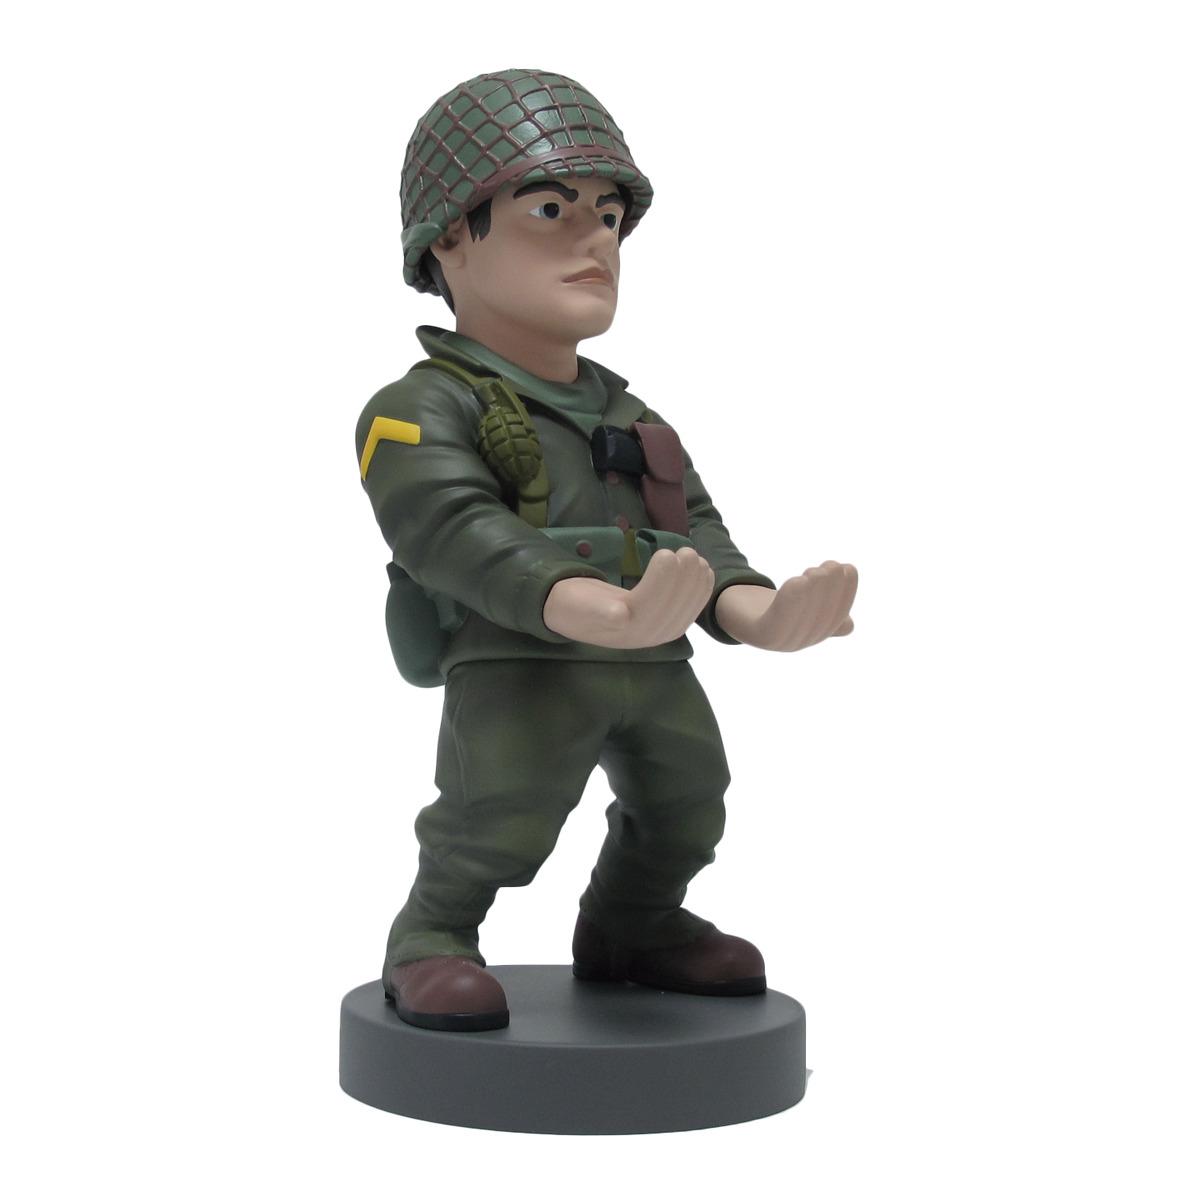 Cable Guy - Base de carga para PS4, Xbox One y Nintendo Switch